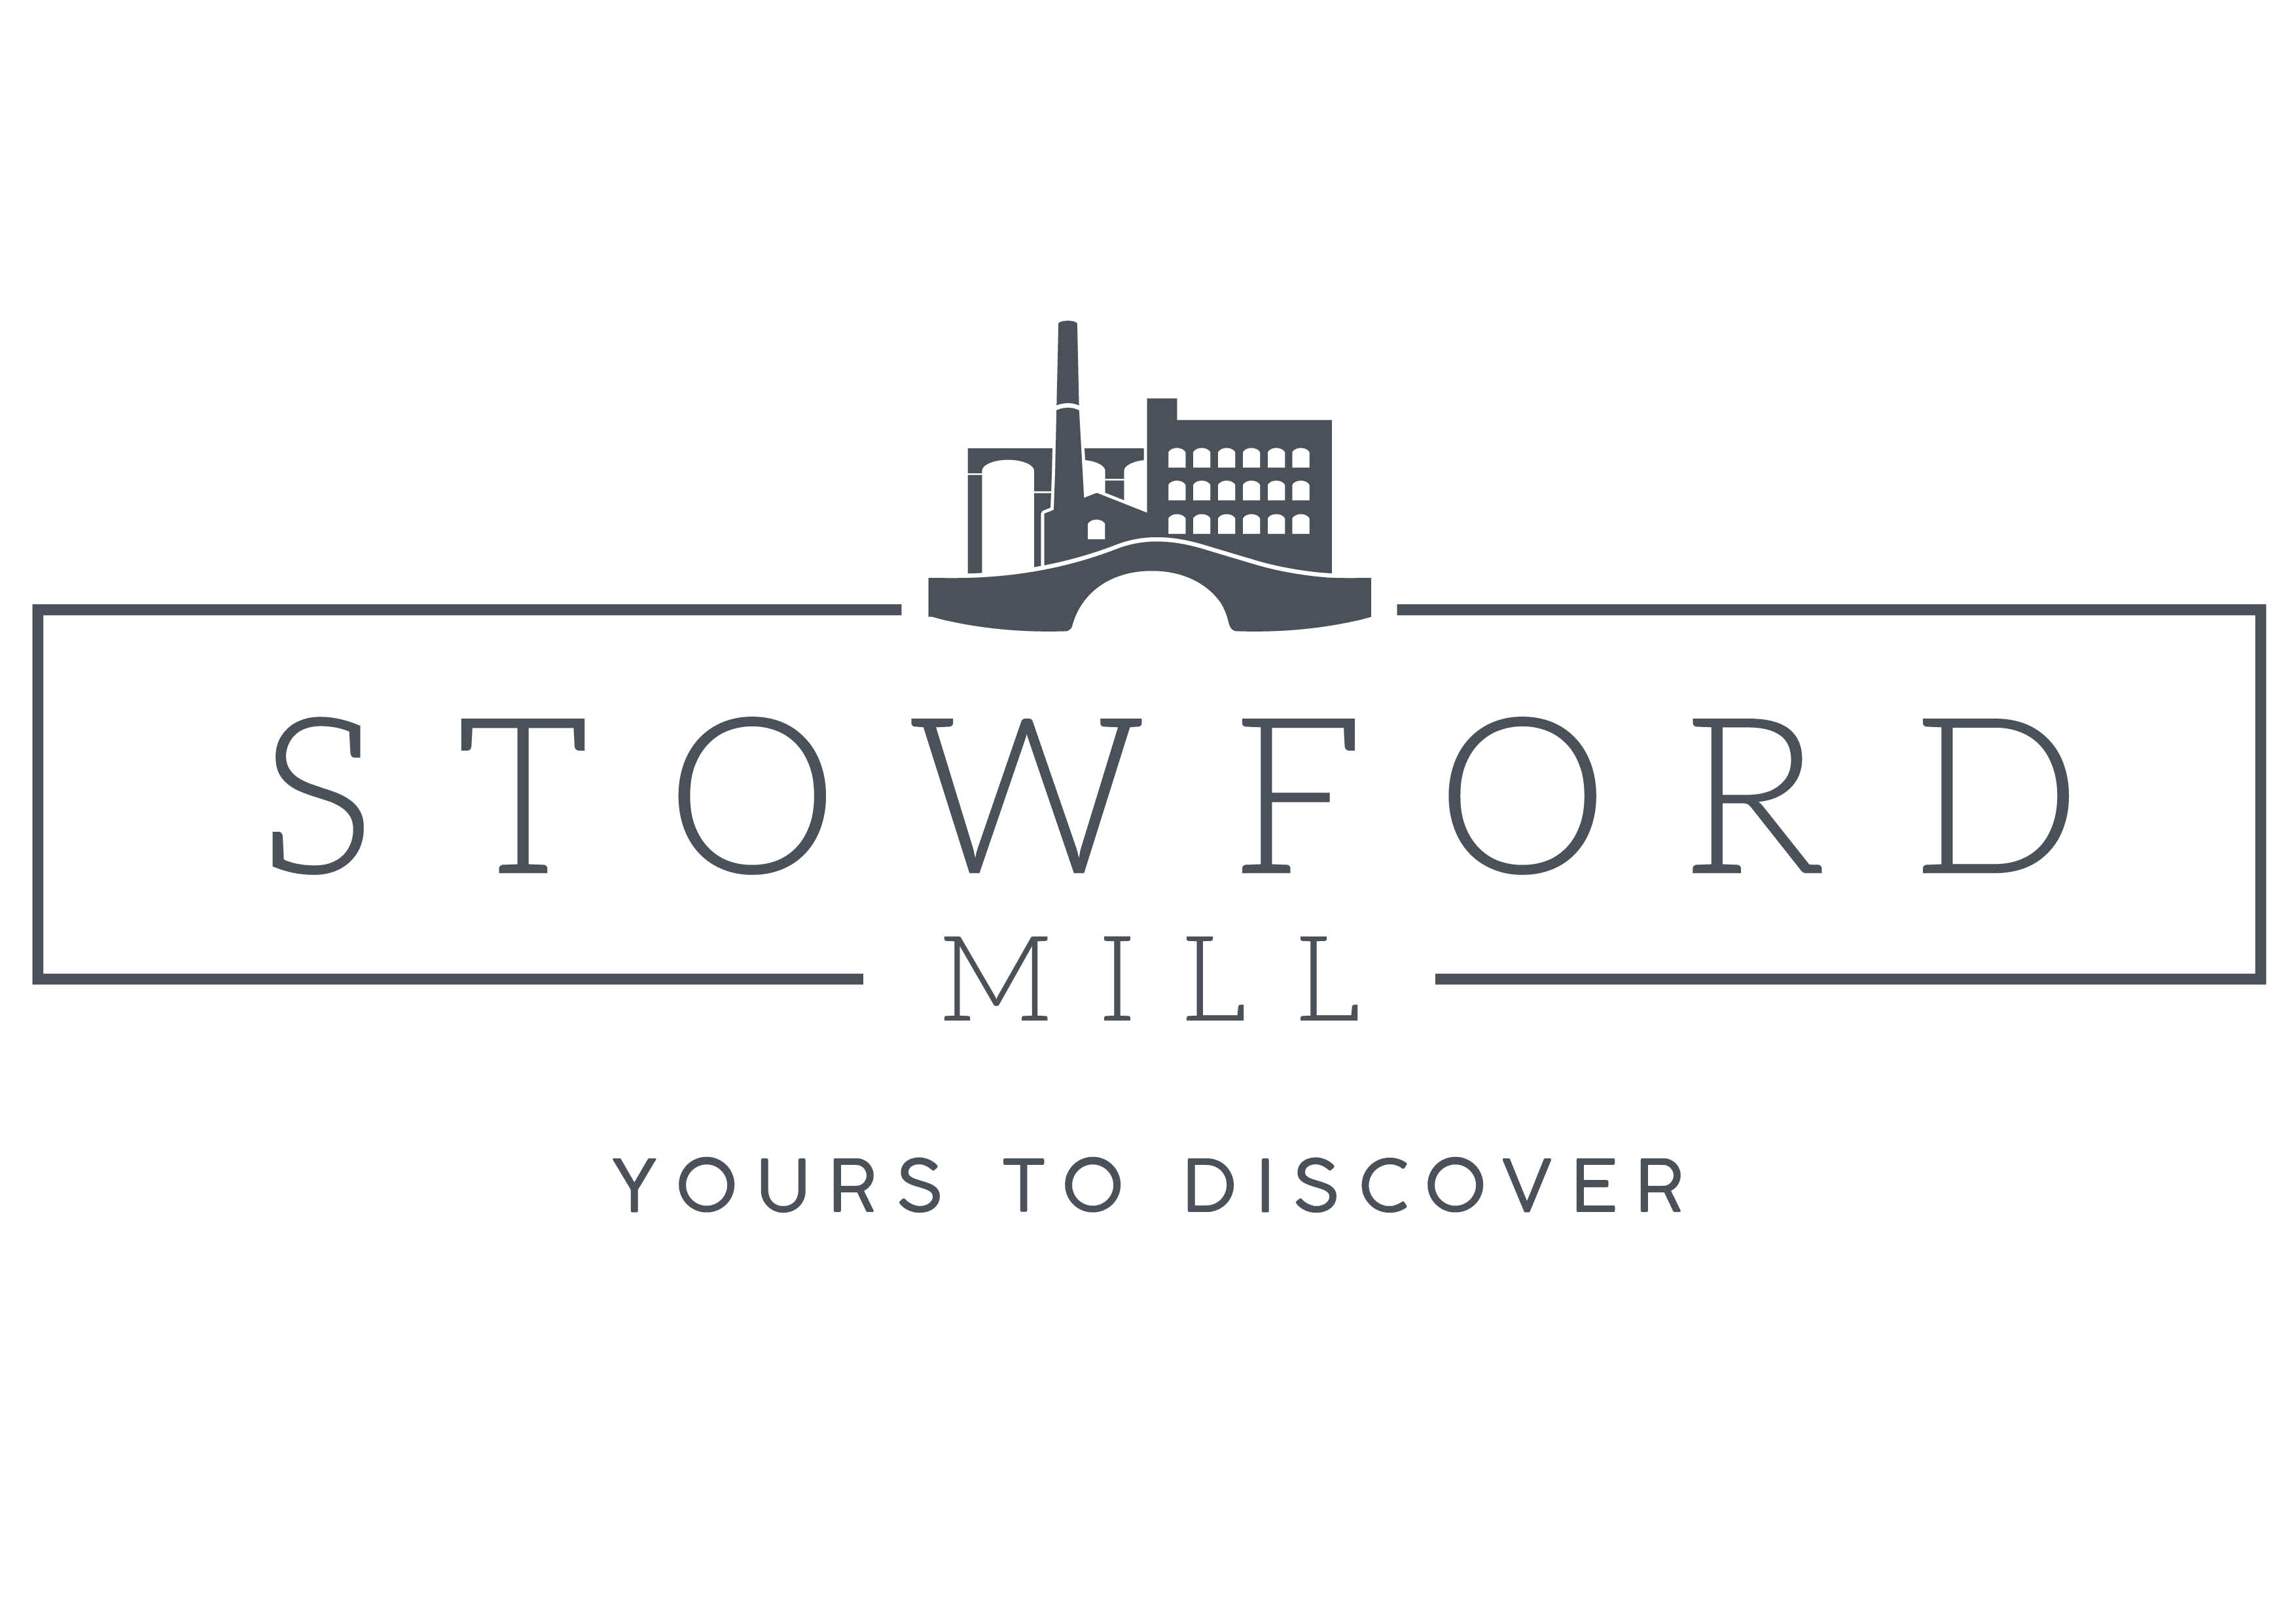 Stowford Mill